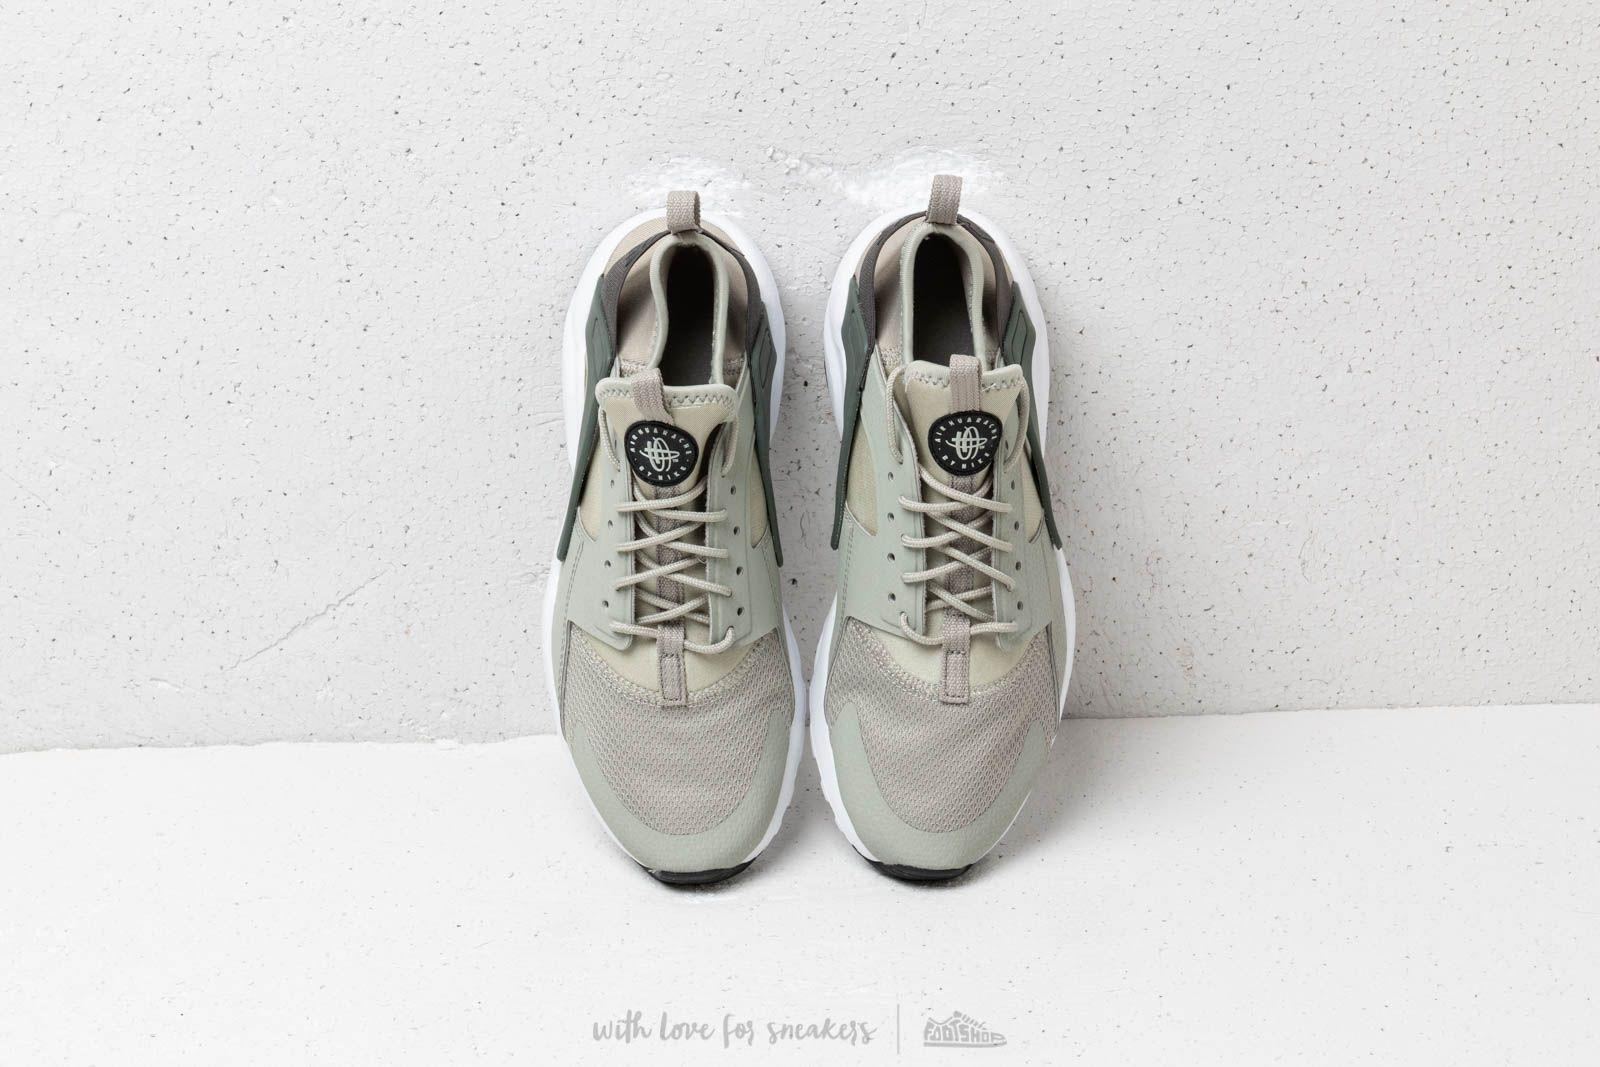 f701c267c384 Lyst - Nike Air Huarache Run Ultra Gs Spruce Fog  Black-mineral ...